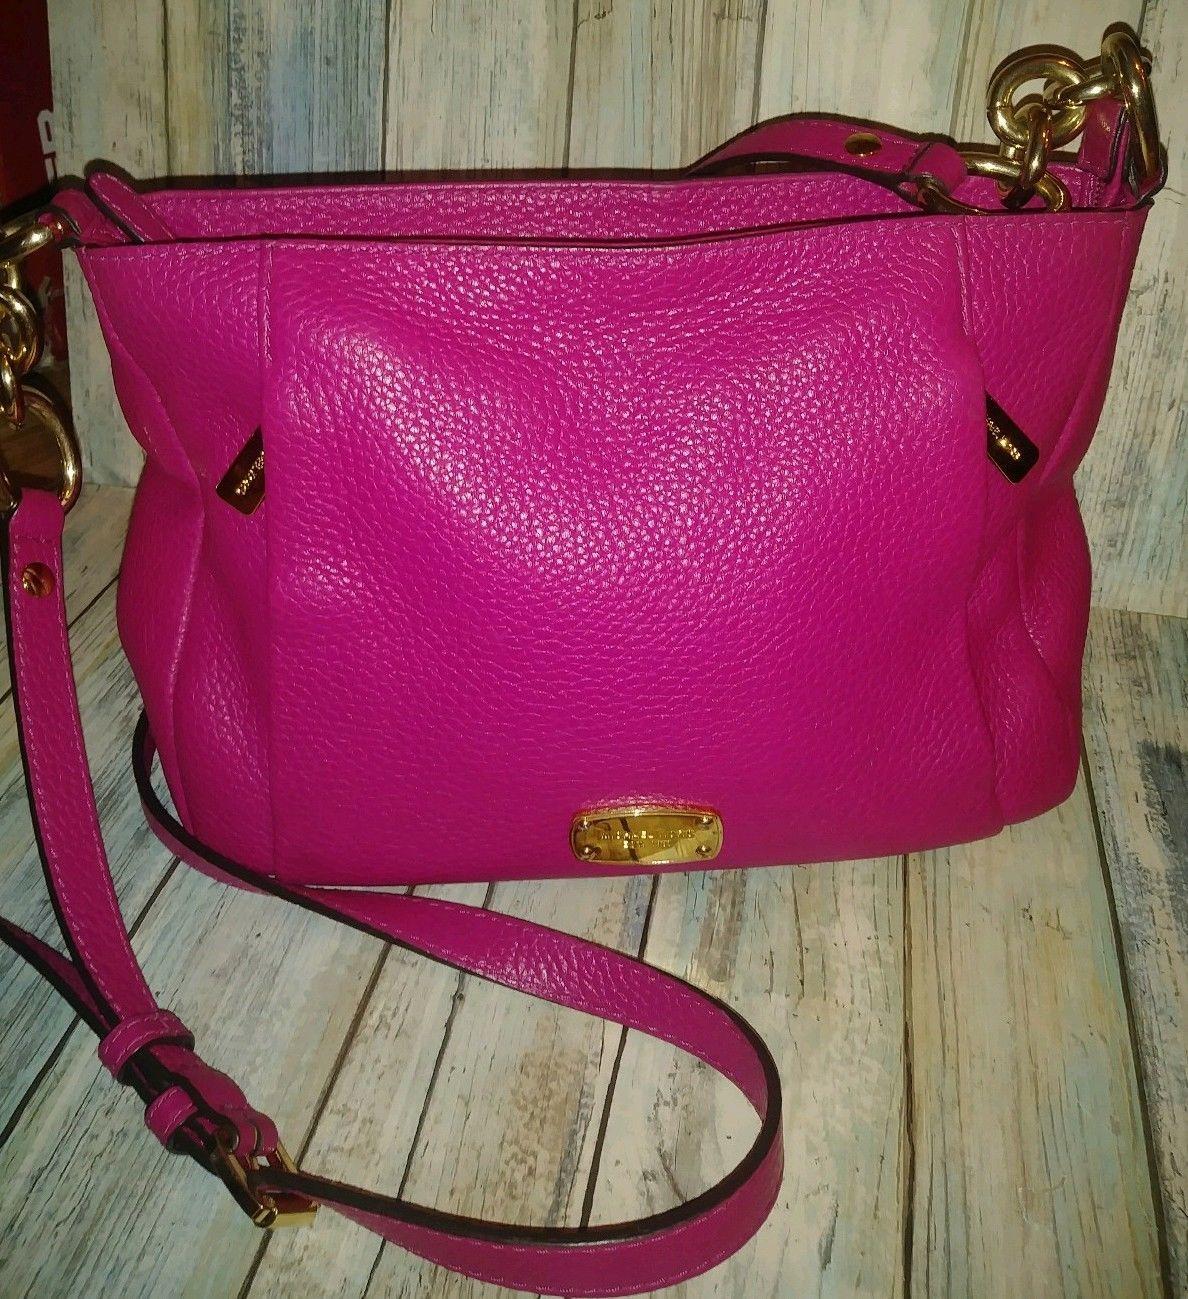 4556d99bb466d1 ... store michael kors hallie md messenger leather crossbody purse pink  lipstick bag 248 f1700 cb0a0 ...